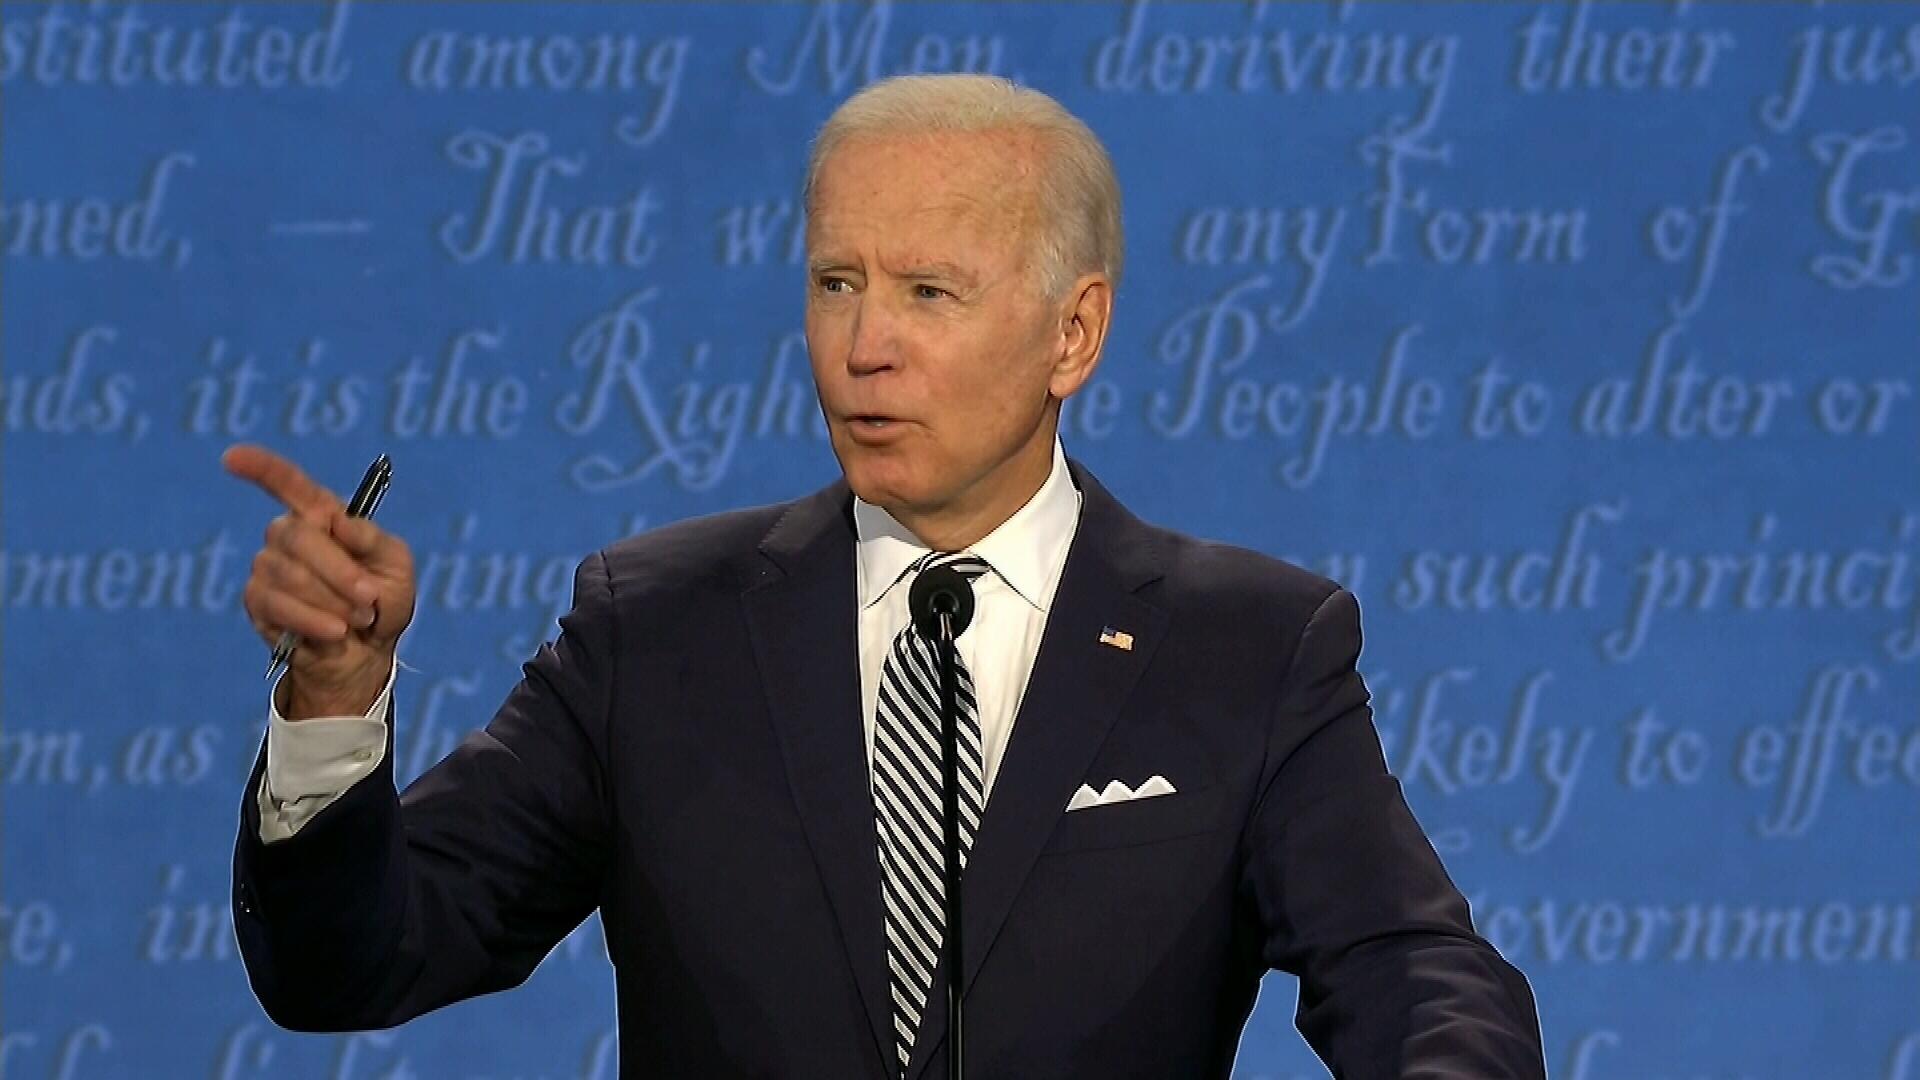 Biden on COVID-19: 'The president has no plan'